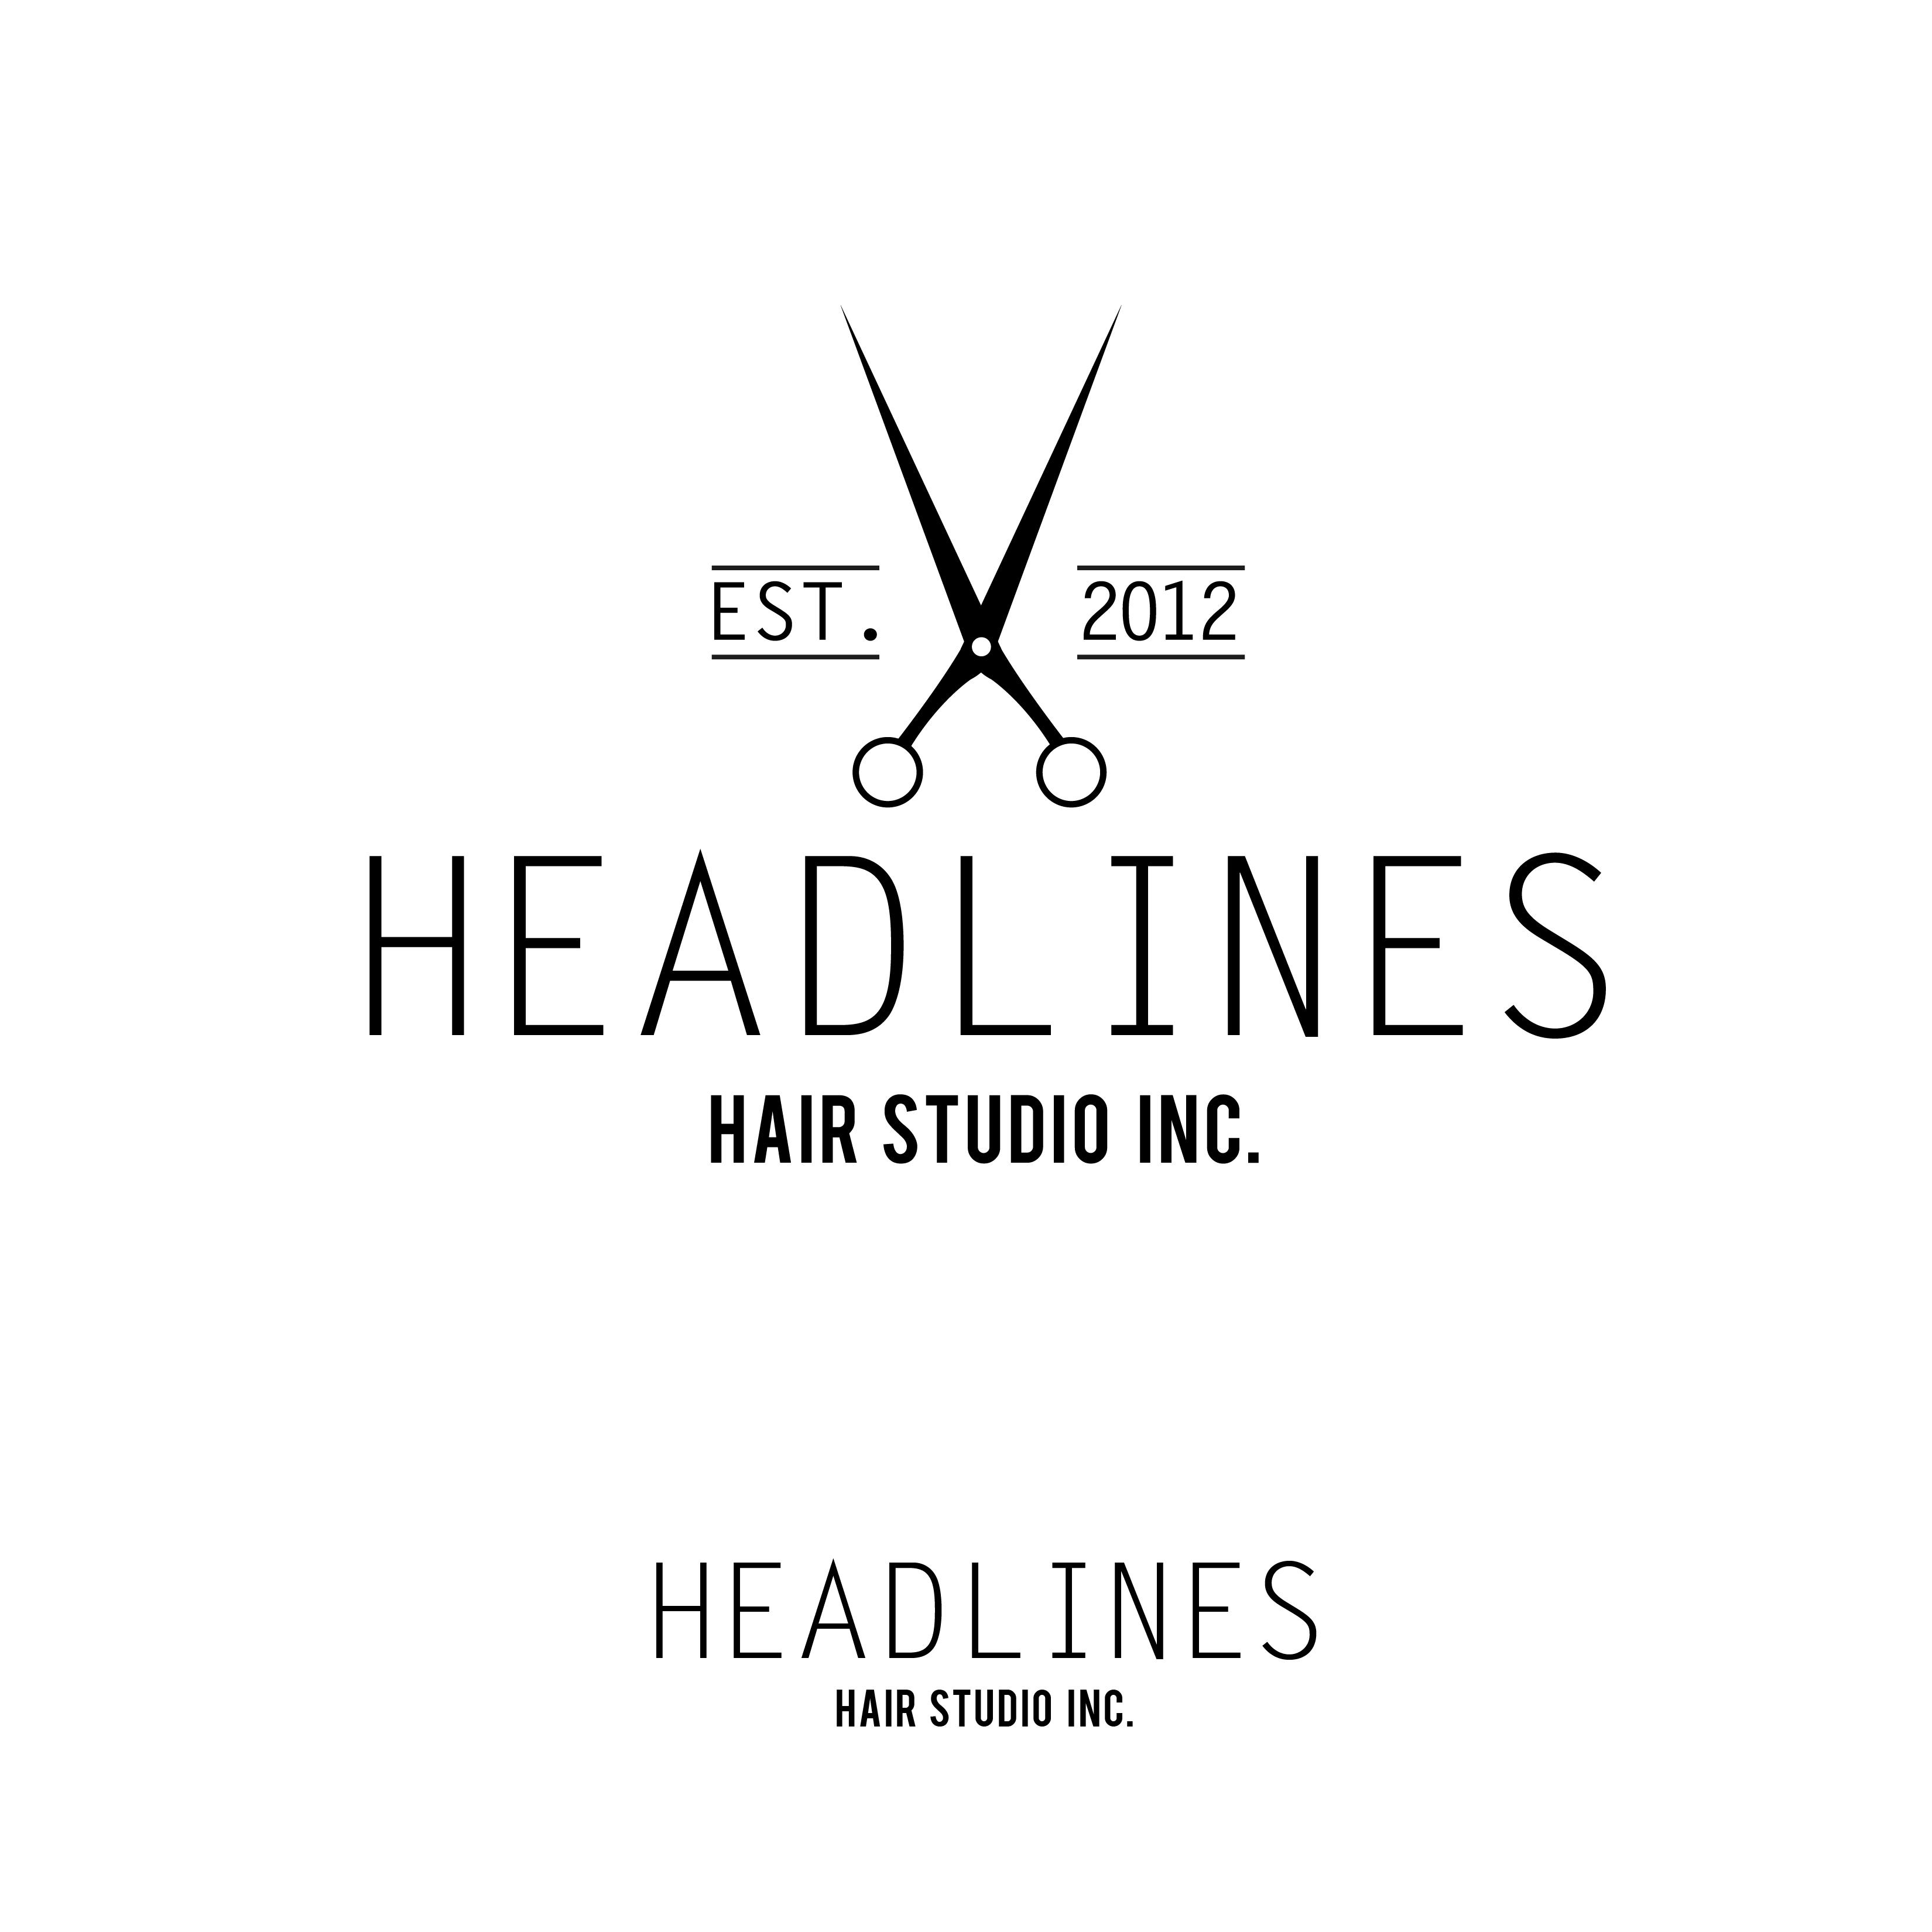 Logo Design by jasonbrycehardesty - Entry No. 86 in the Logo Design Contest Fun Logo Design for HEADLINES HAIR STUDIO INC.